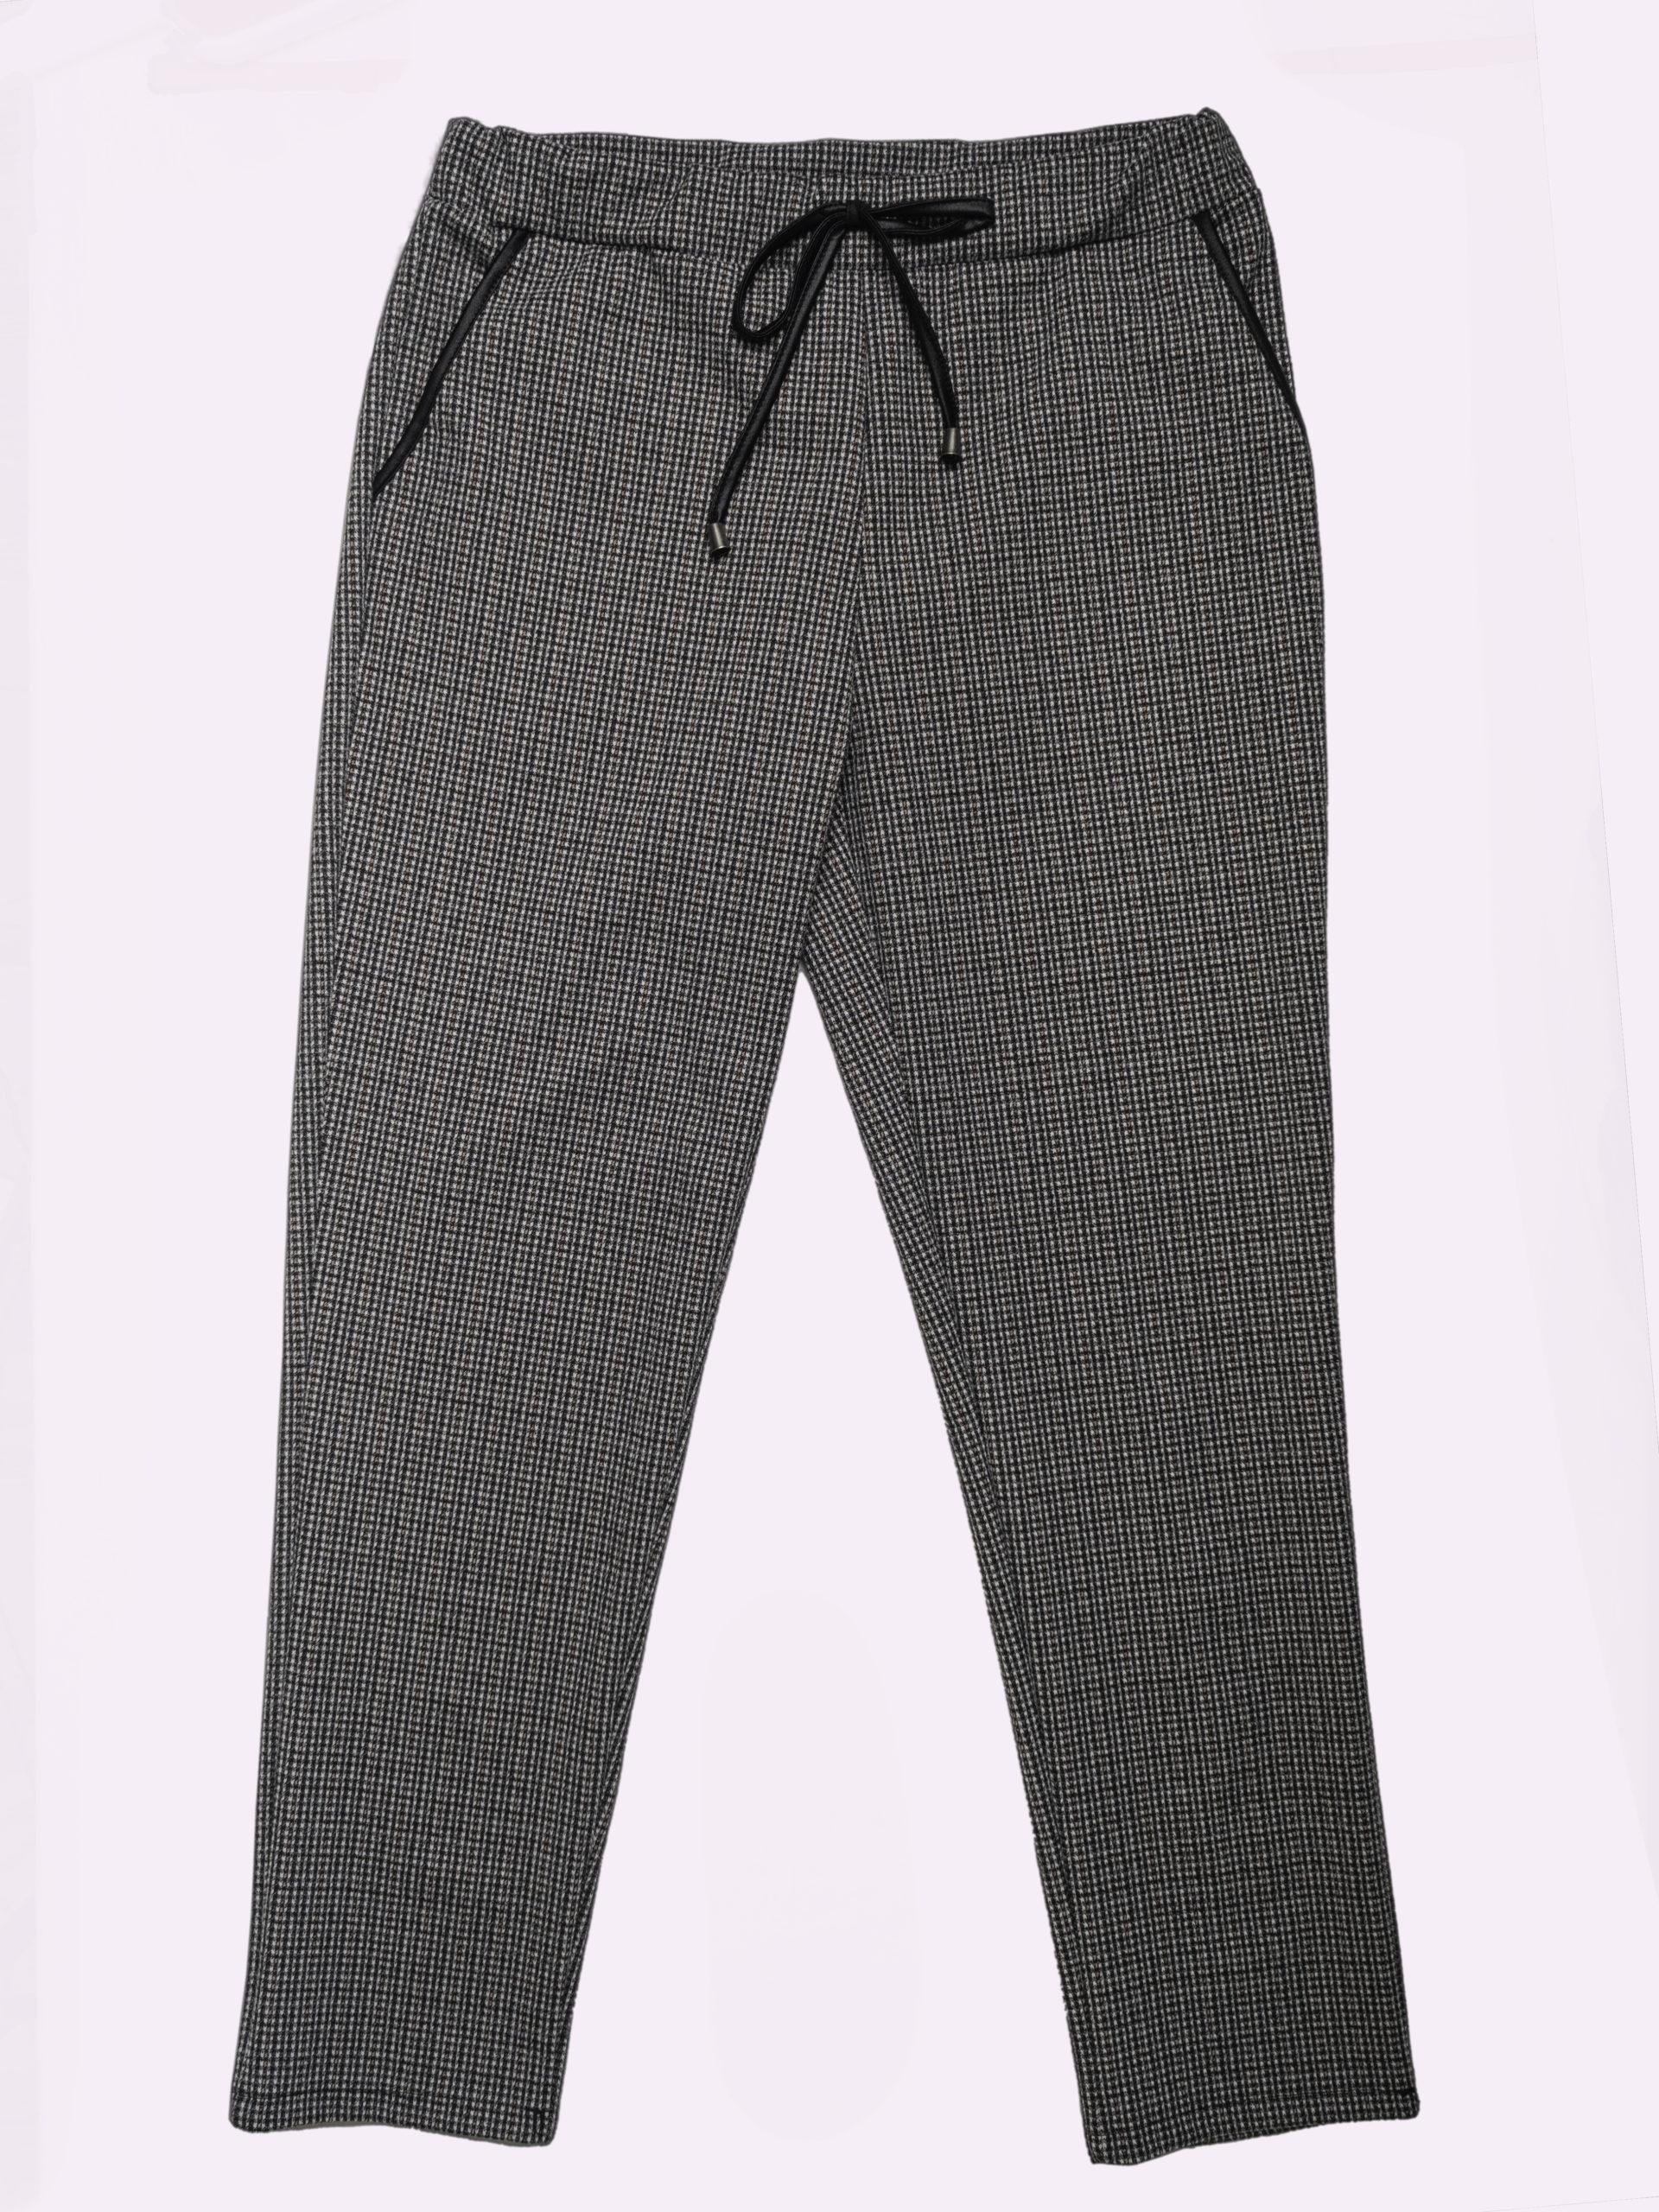 F1942 Pantalone Casual